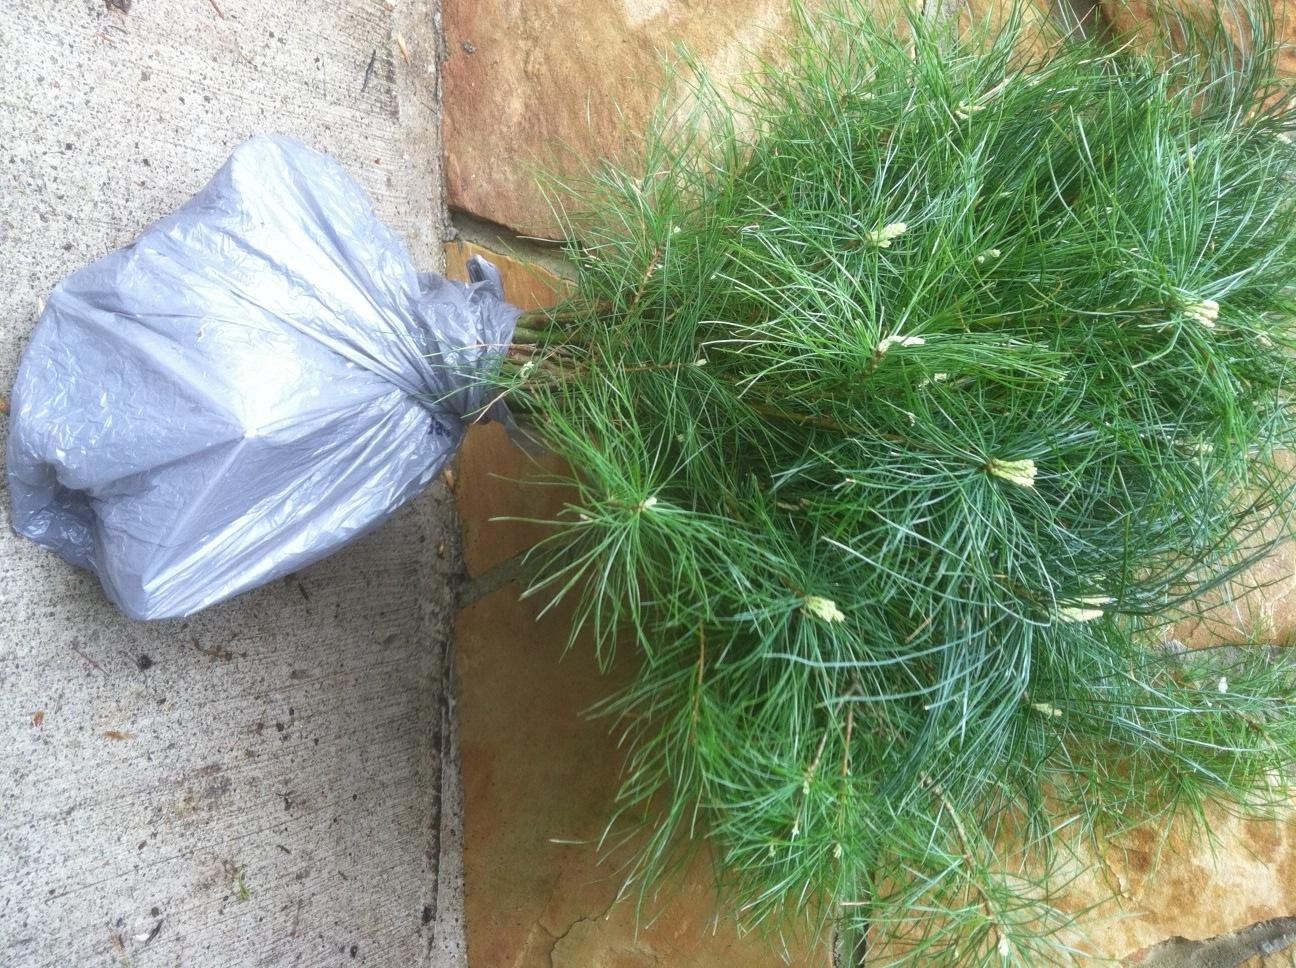 QTY-10 eastern white pine starter trees 36inch evergreen transplant seedlings #HSE